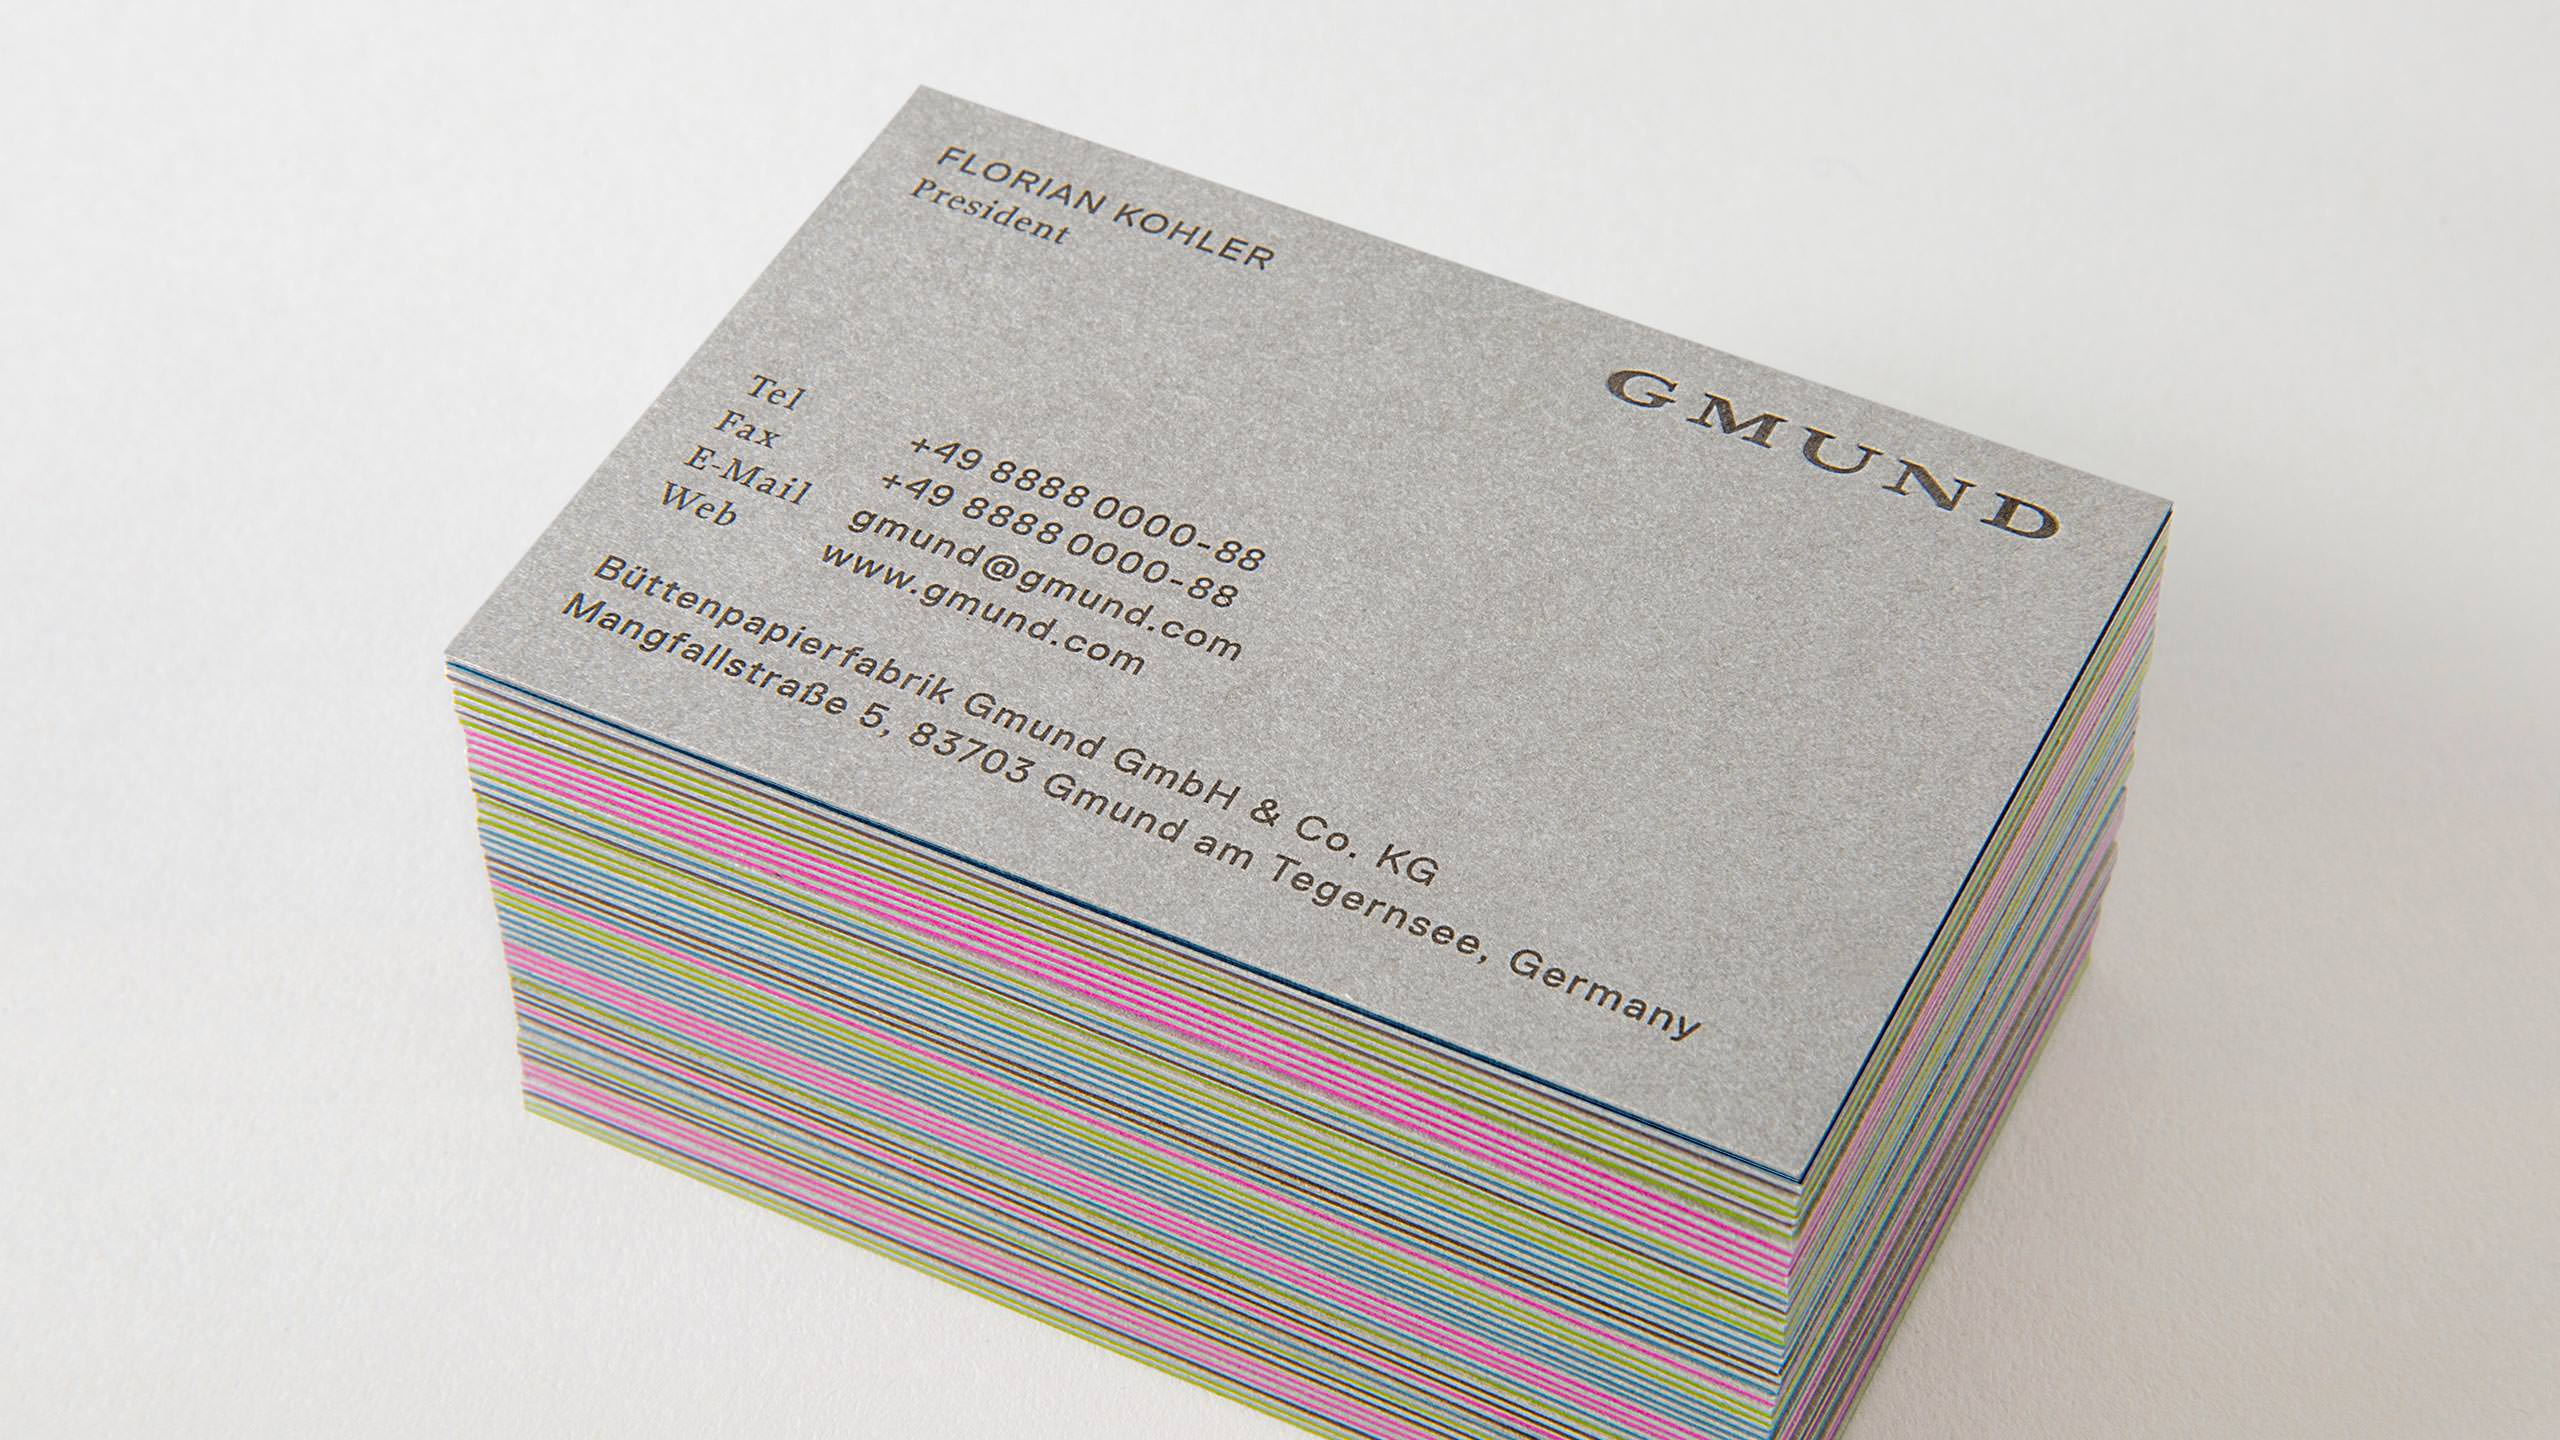 Gmund Brand Refresh Business Cards Stacked - Florian Kohler